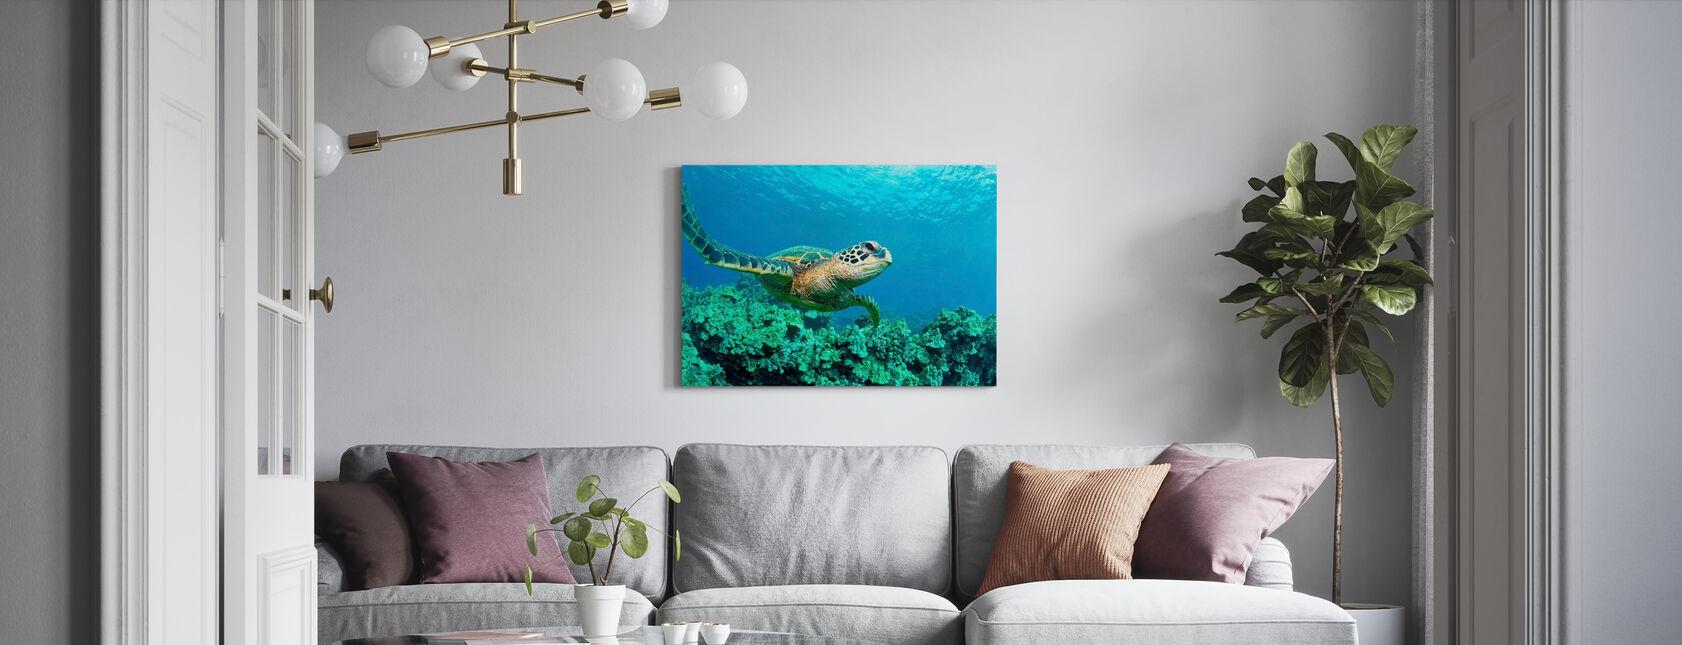 Zeeschildpad in Koraal - Canvas print - Woonkamer